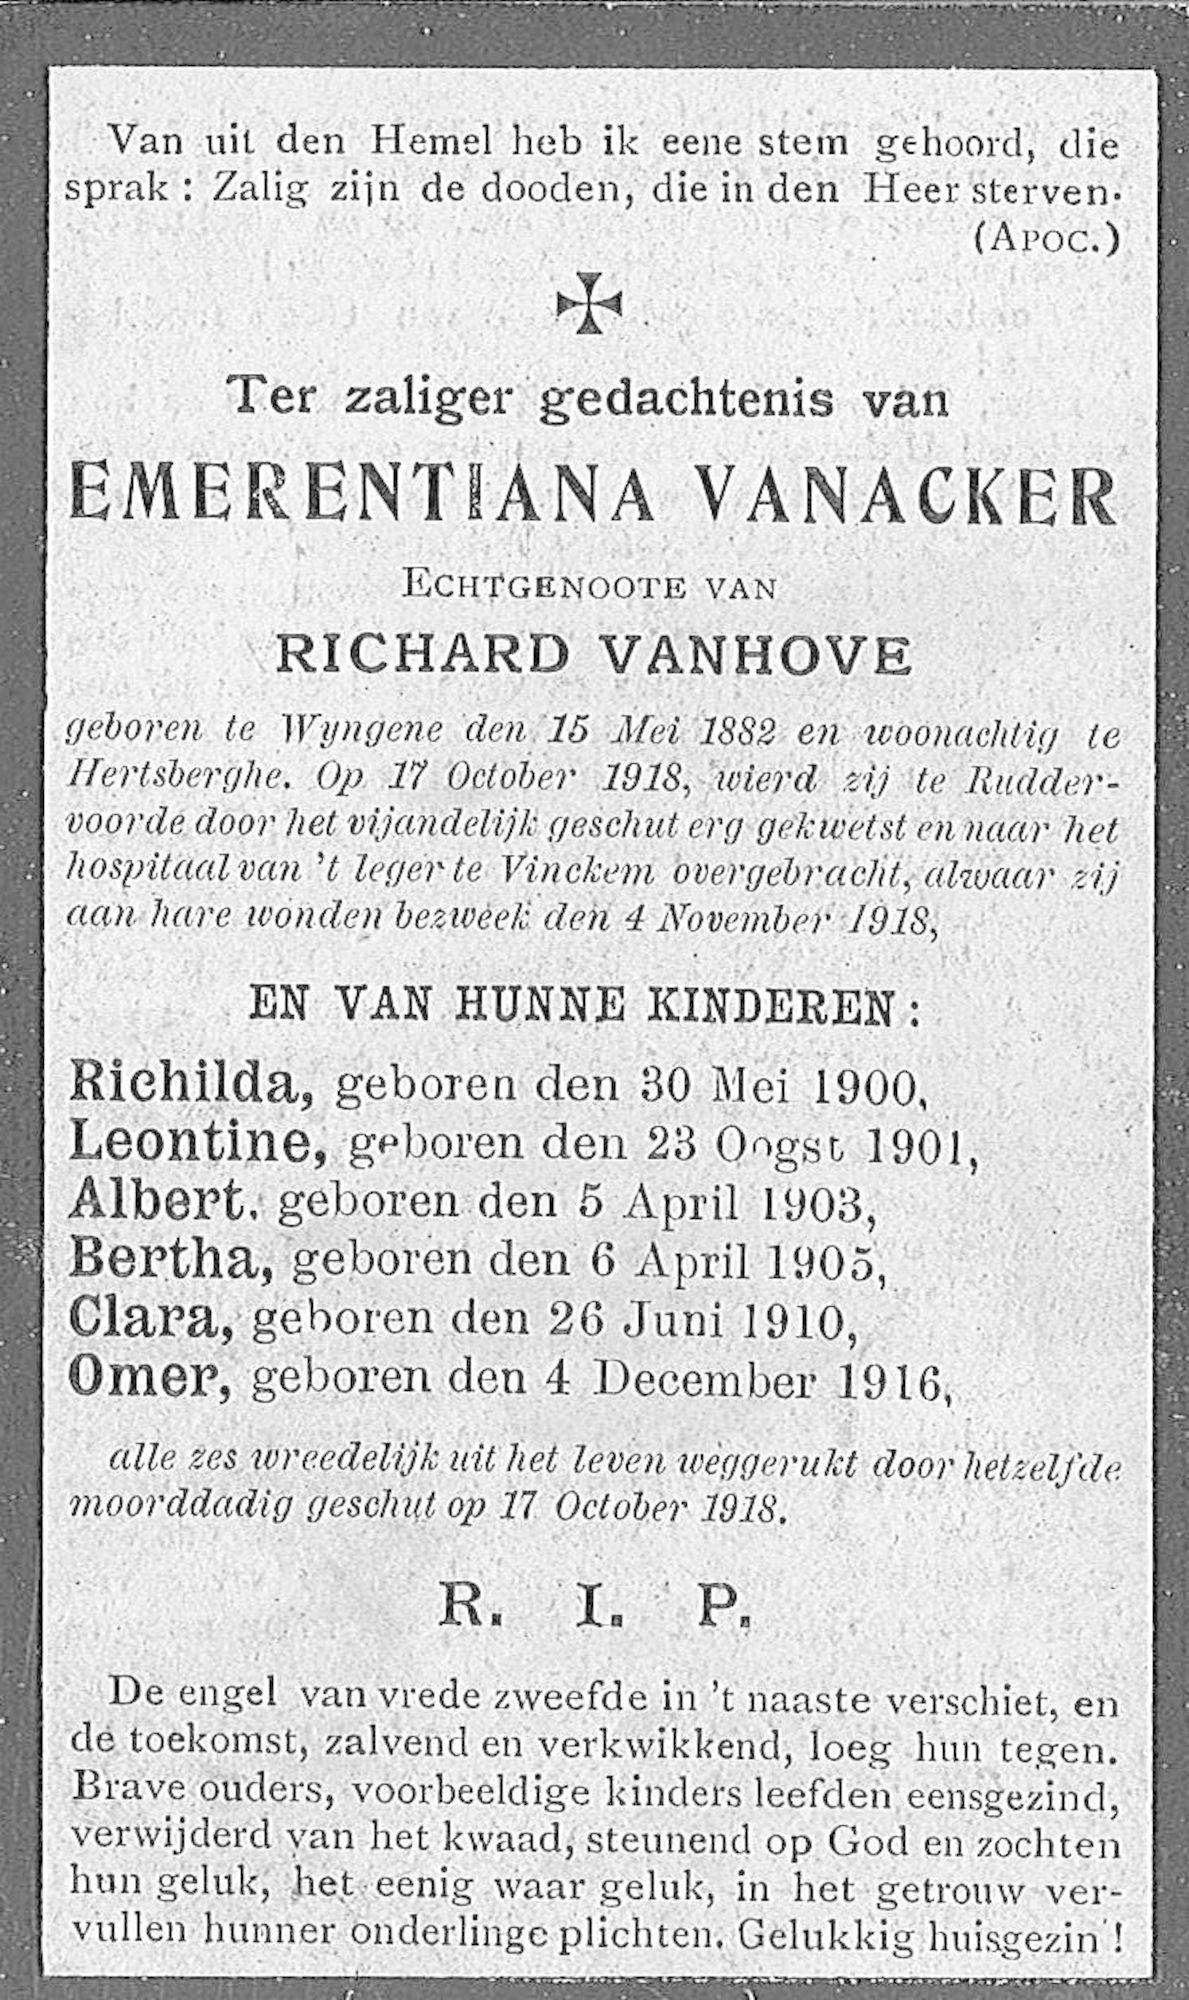 Emerentia Vanacker